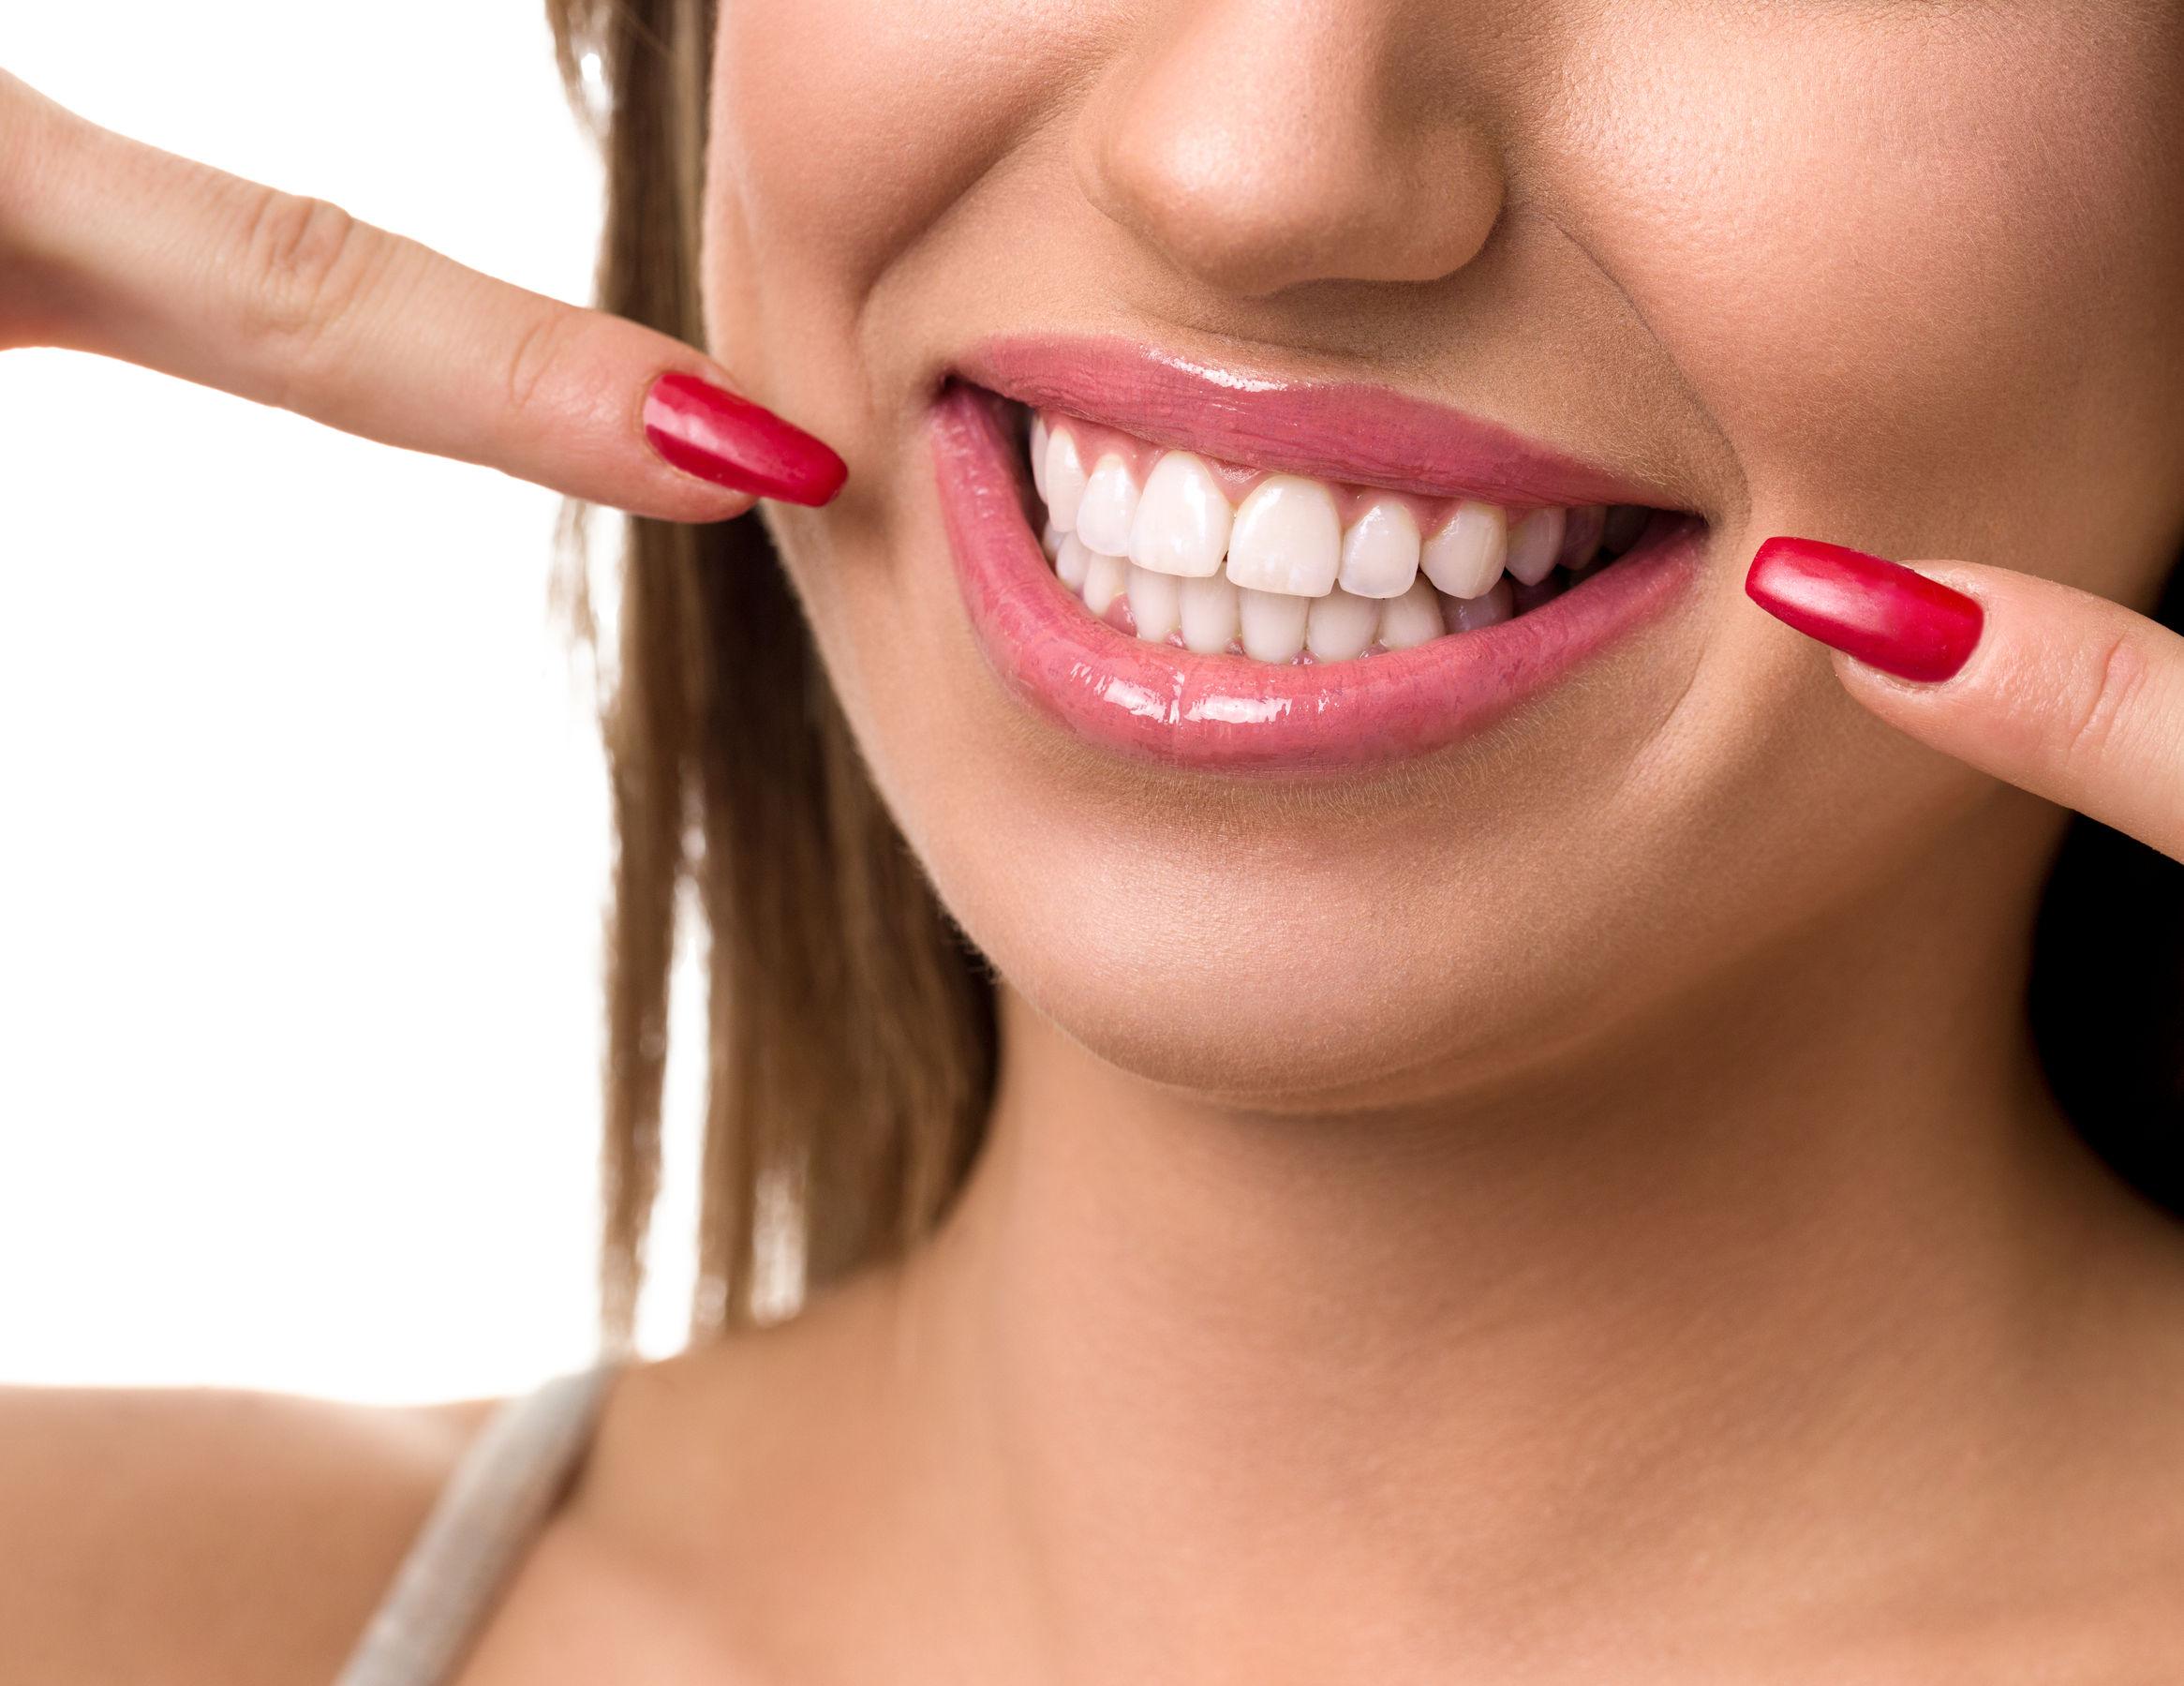 Where Can I Get Teeth Whitening In Glen Cove?